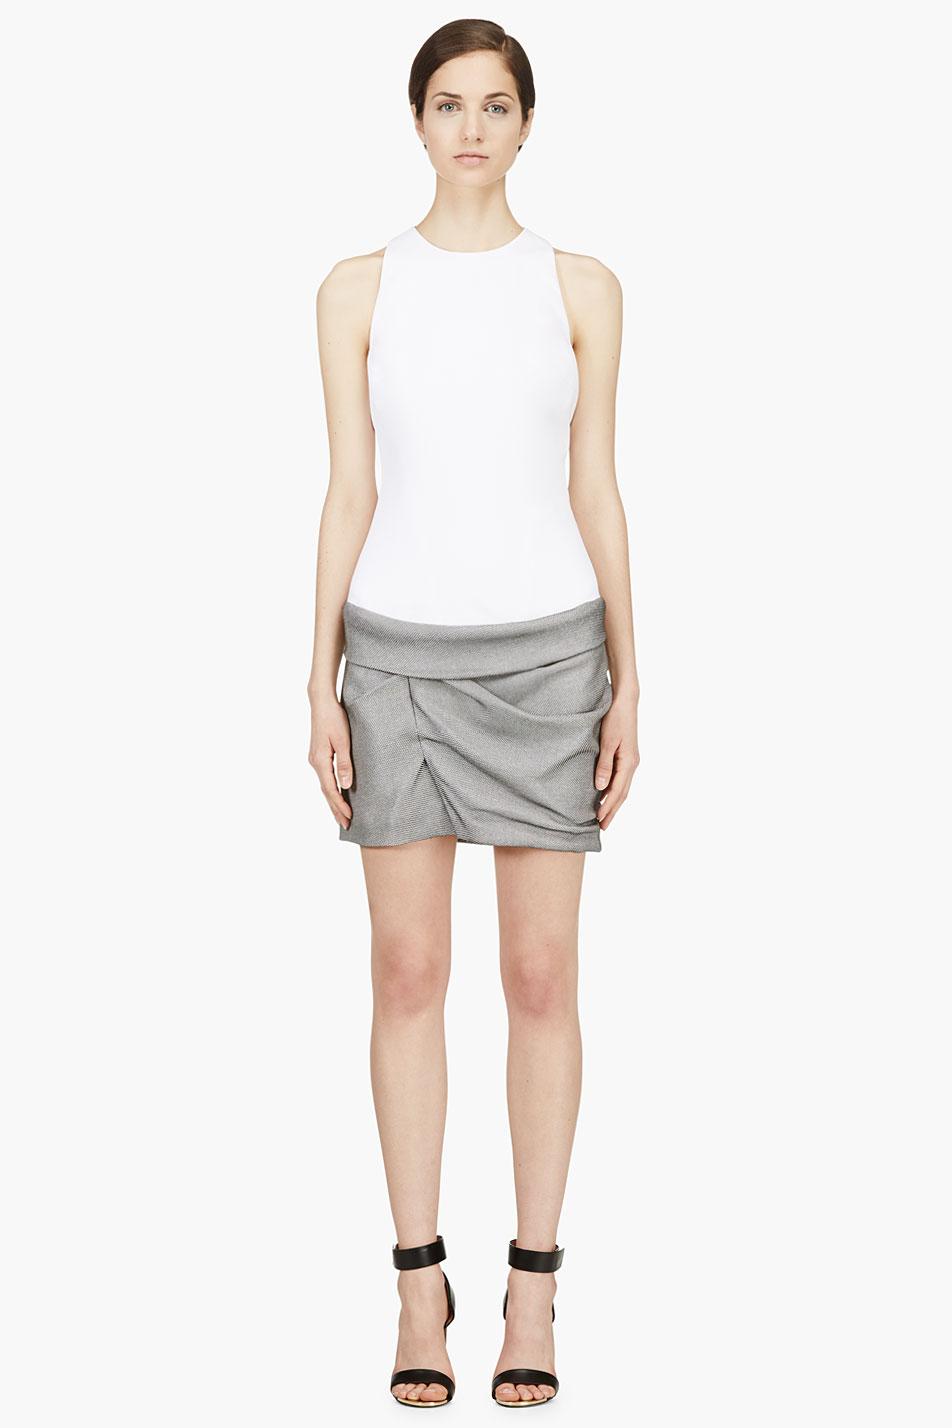 mugler white and grey contrasting gathered dress